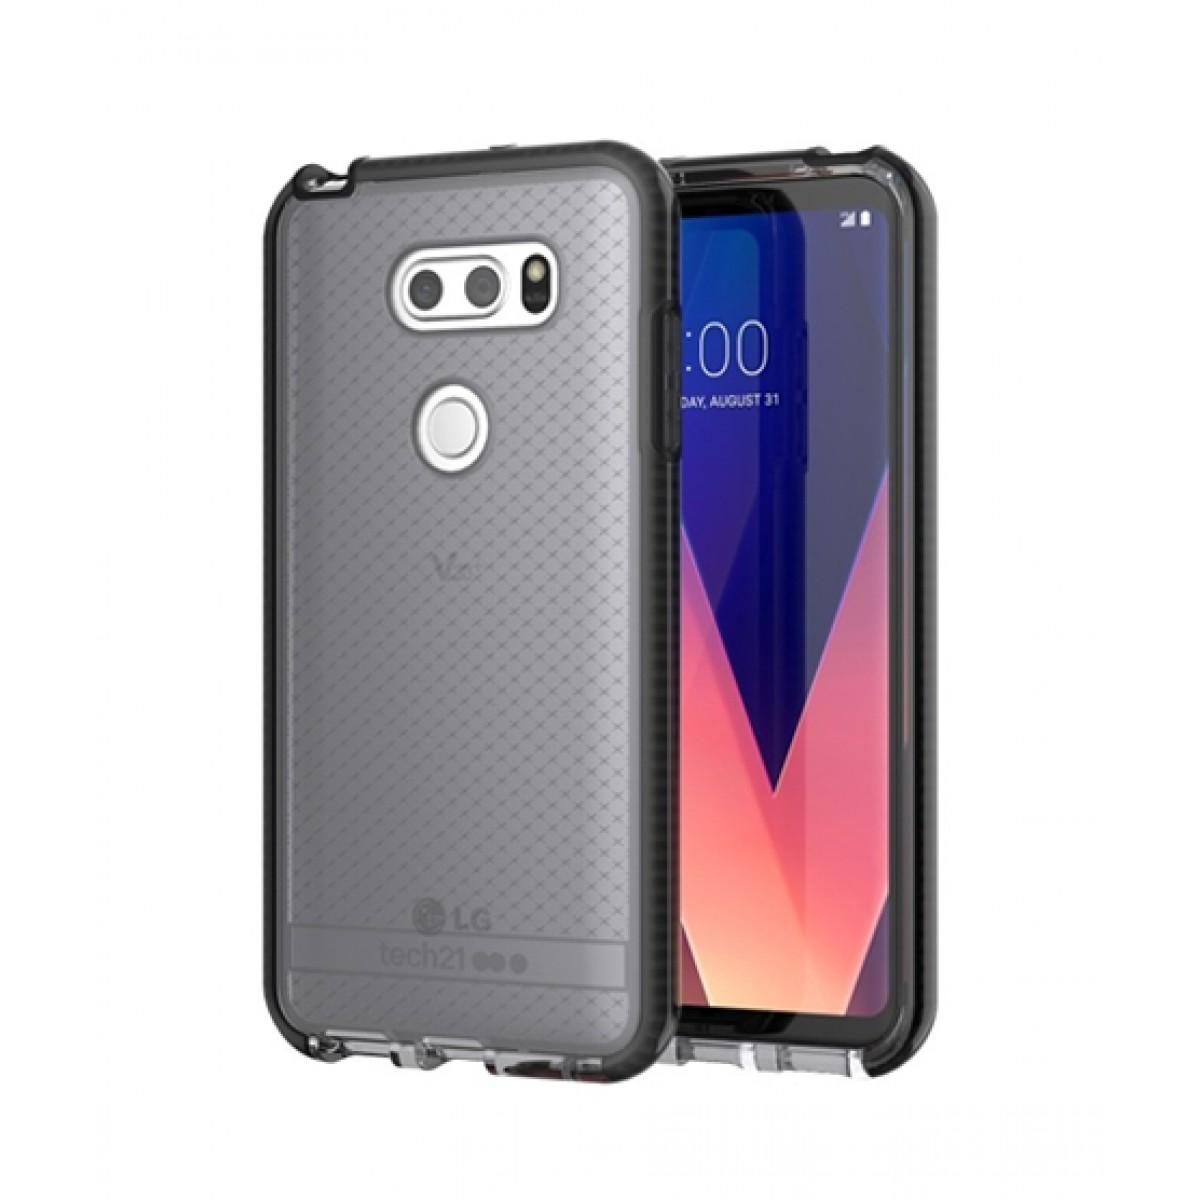 the latest c488b 58706 Tech21 Evo Check Smokey/Black Case For LG V30